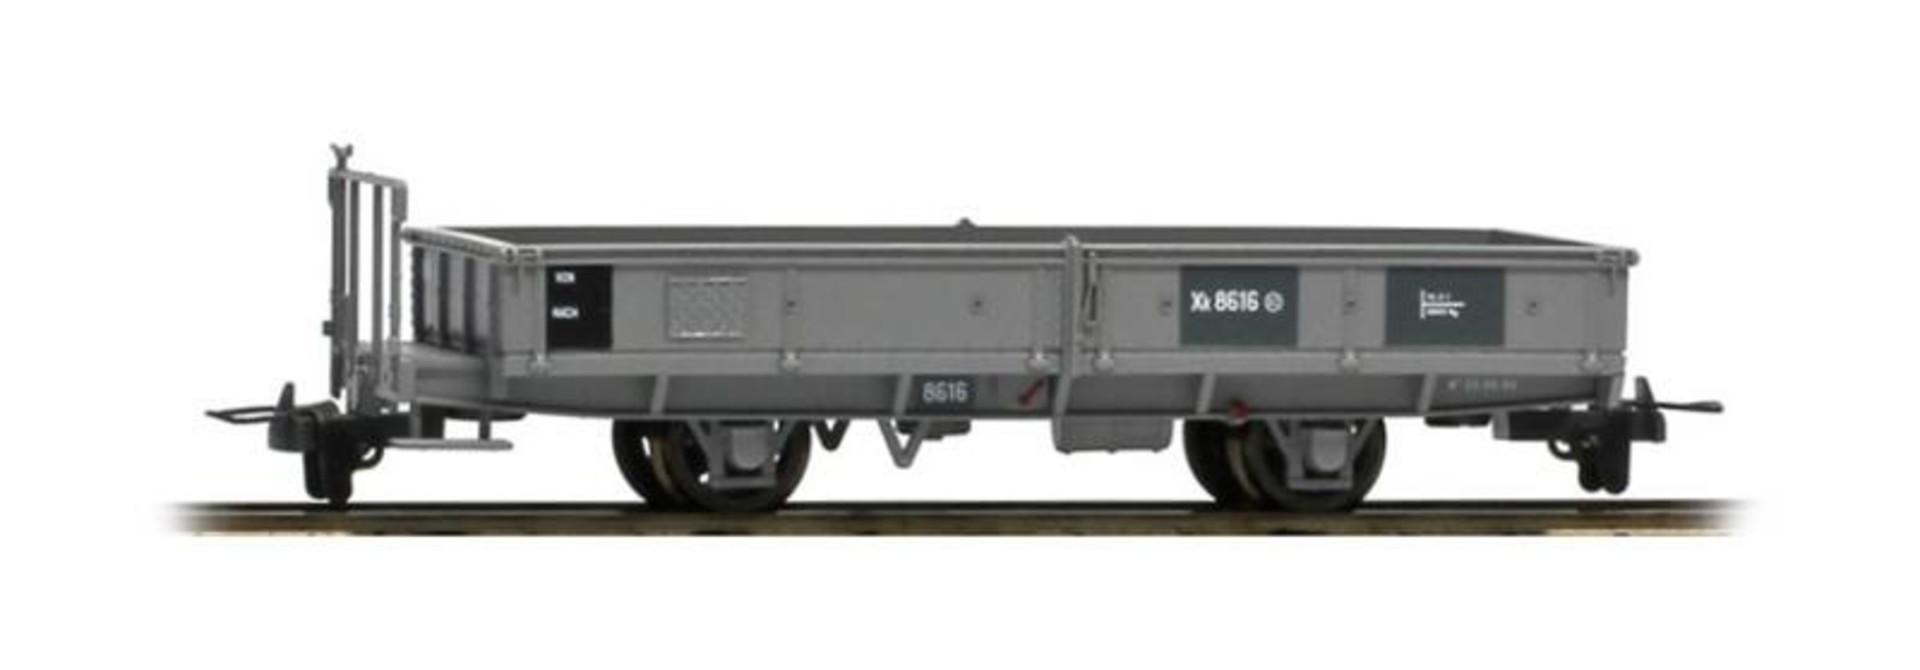 2257196 RhB Xk 8616 Bahndienst-Flachwagen grau